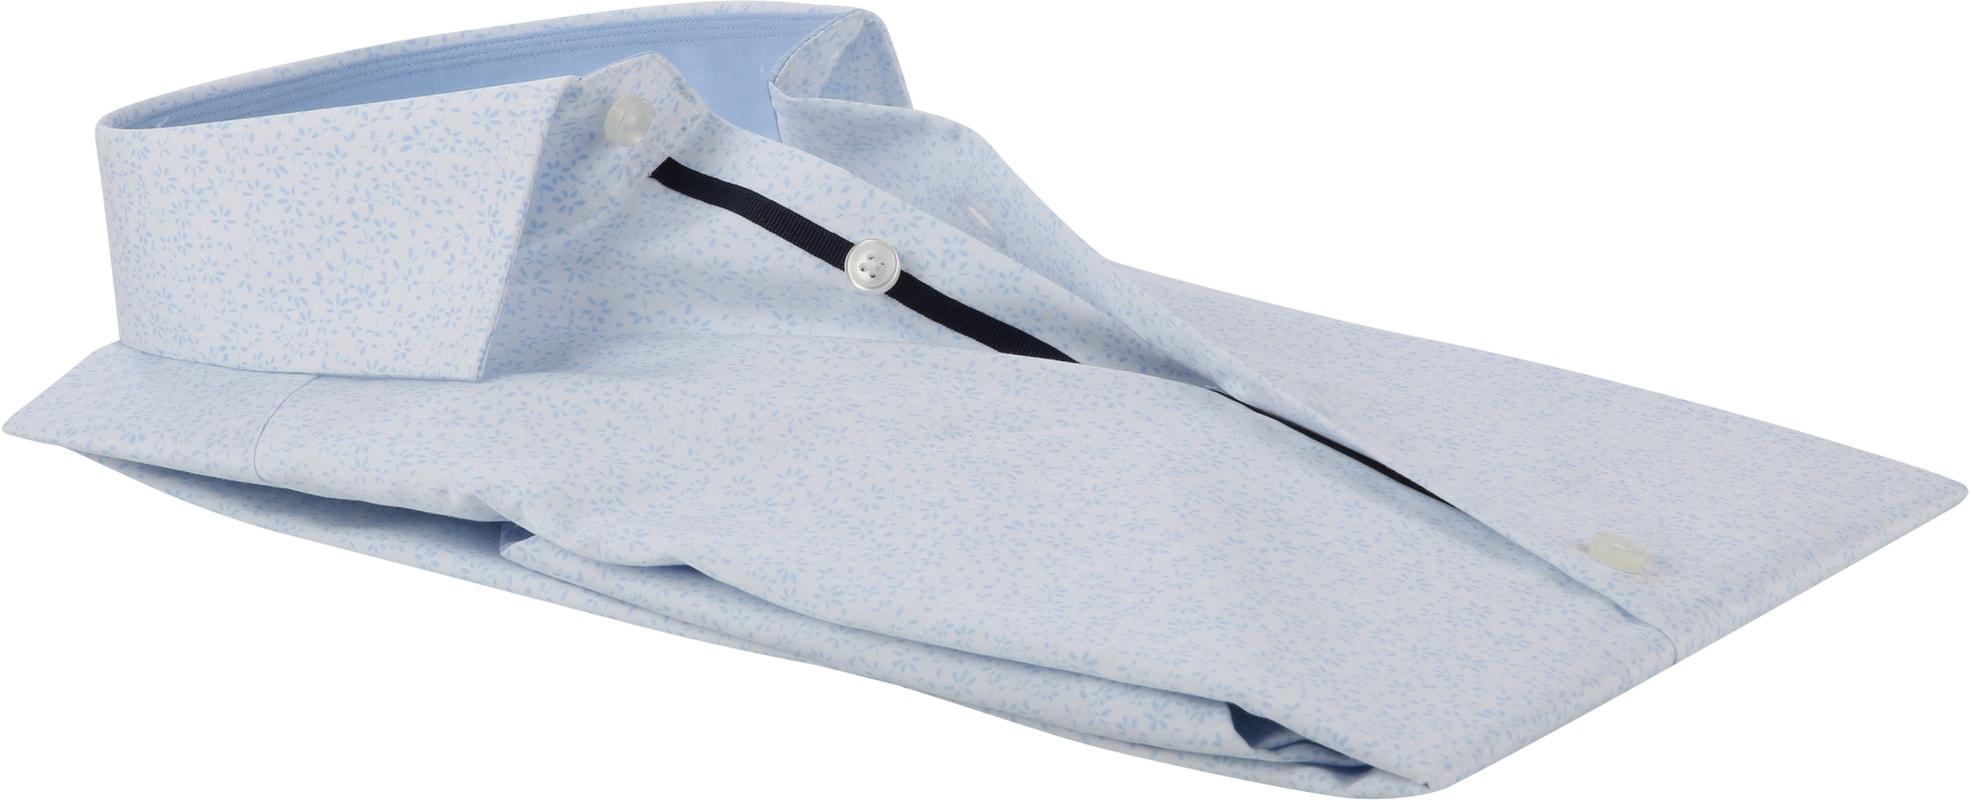 OLYMP Luxor Bloem Overhemd MF Wit - Blauw maat 39